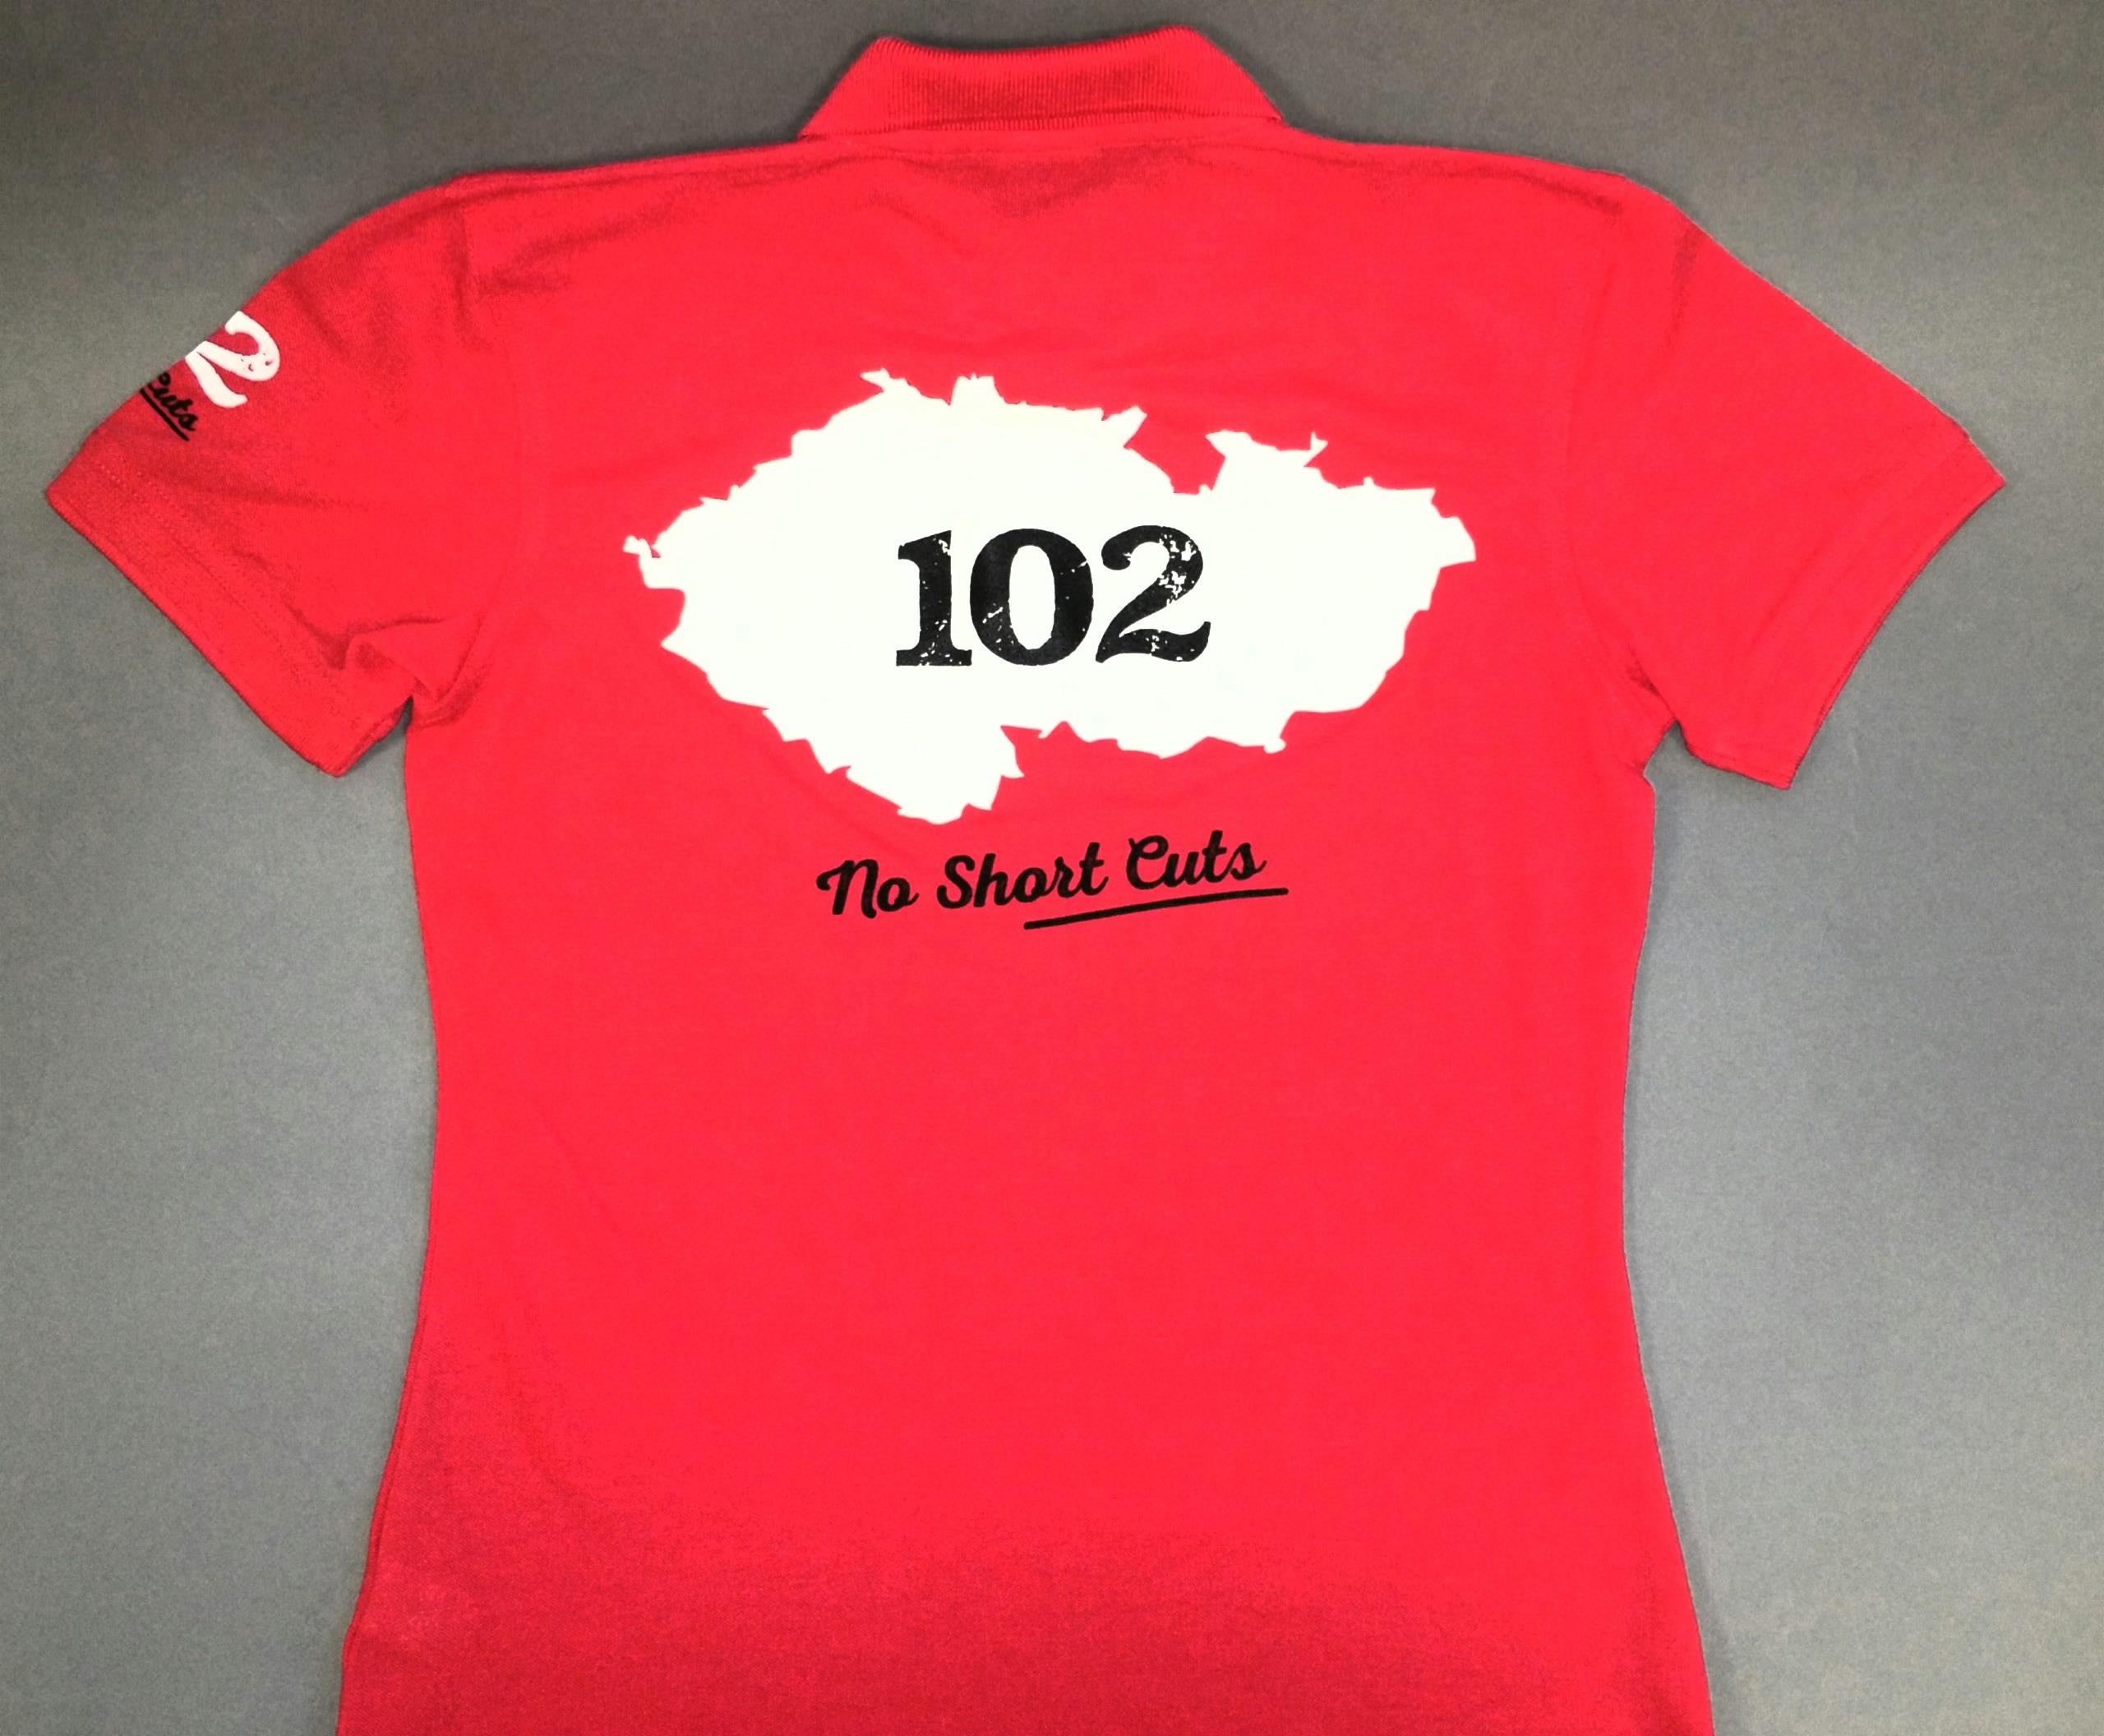 Cheap Screen Printed Shirts